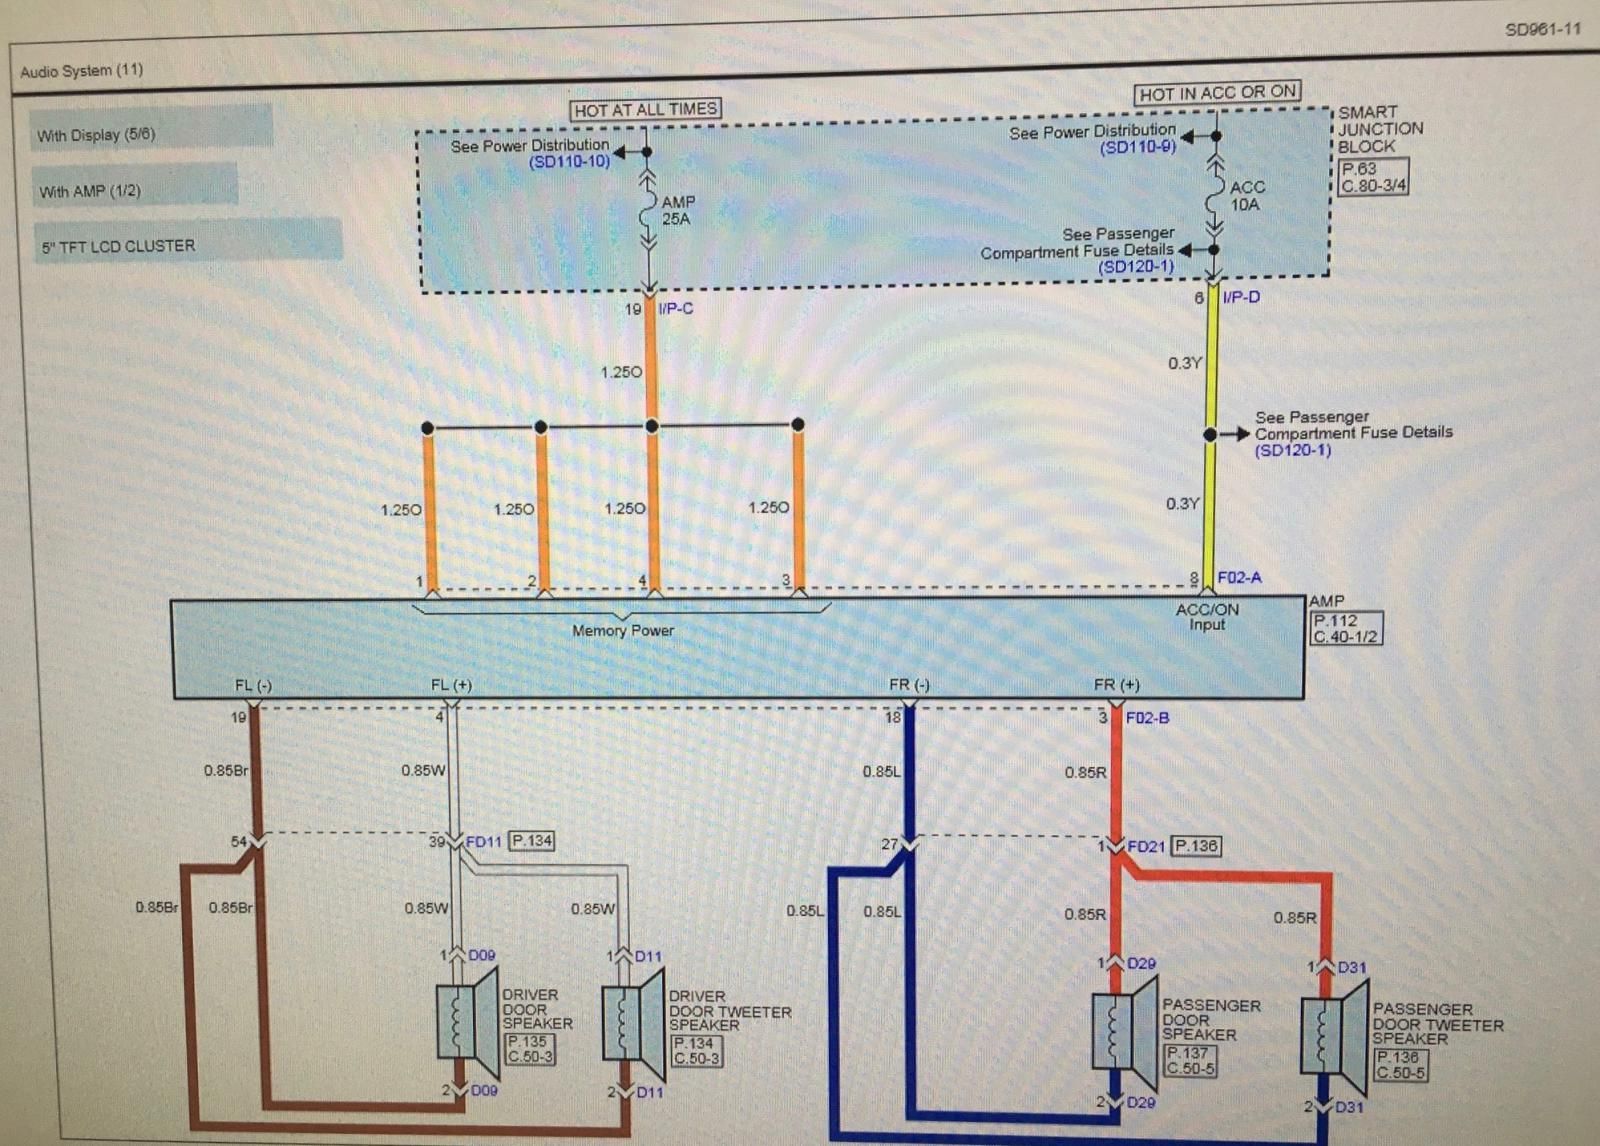 [DHAV_9290]  Wiring Diagram | Kia Forum | 2015 Kia Sportage Wiring Diagram |  | Kia Forum